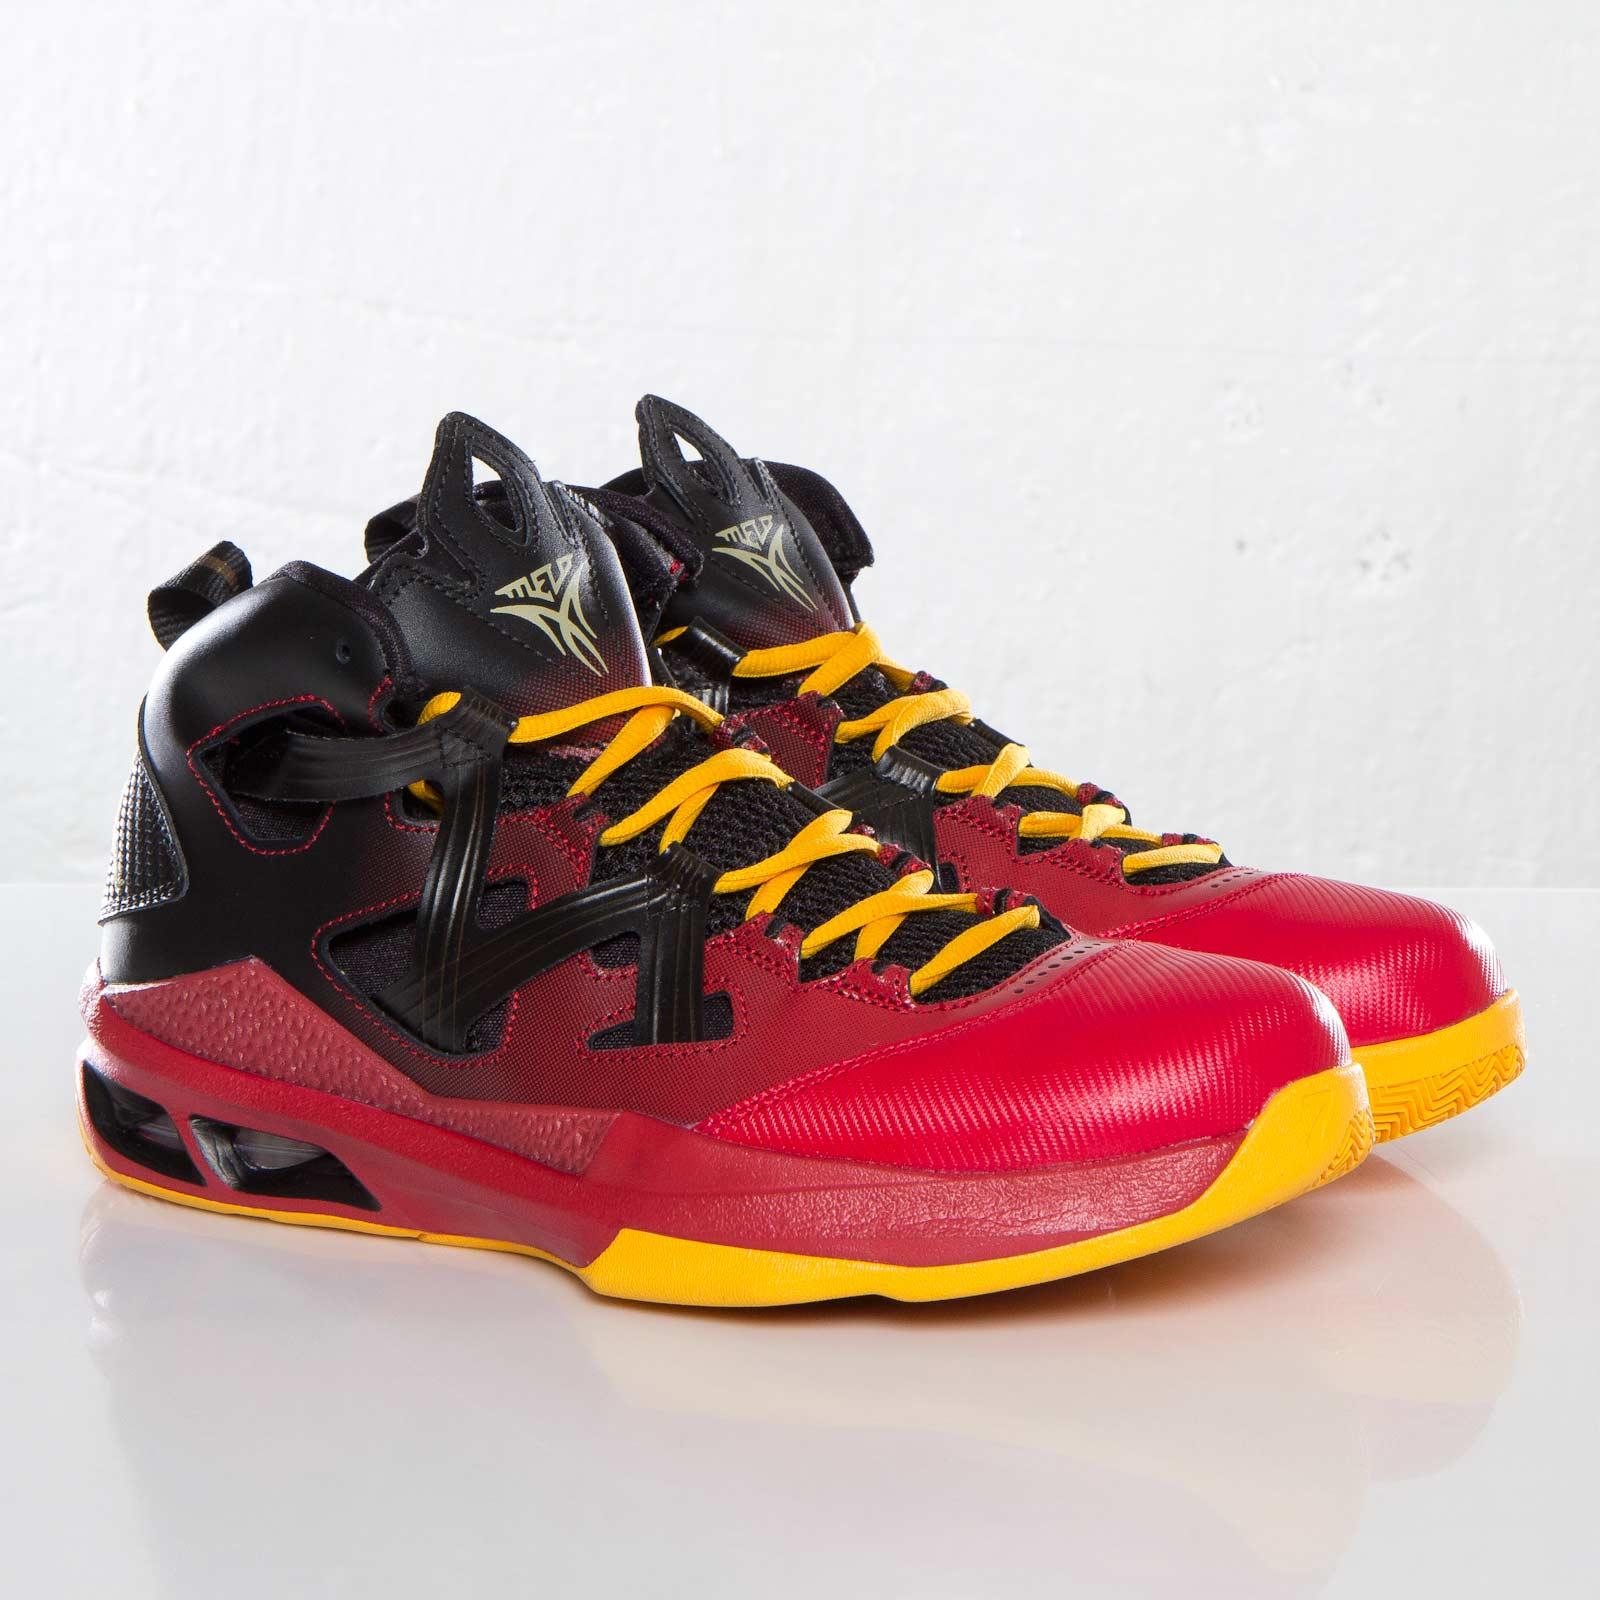 huge discount c6b02 fa4f1 Jordan Brand Jordan Melo M9